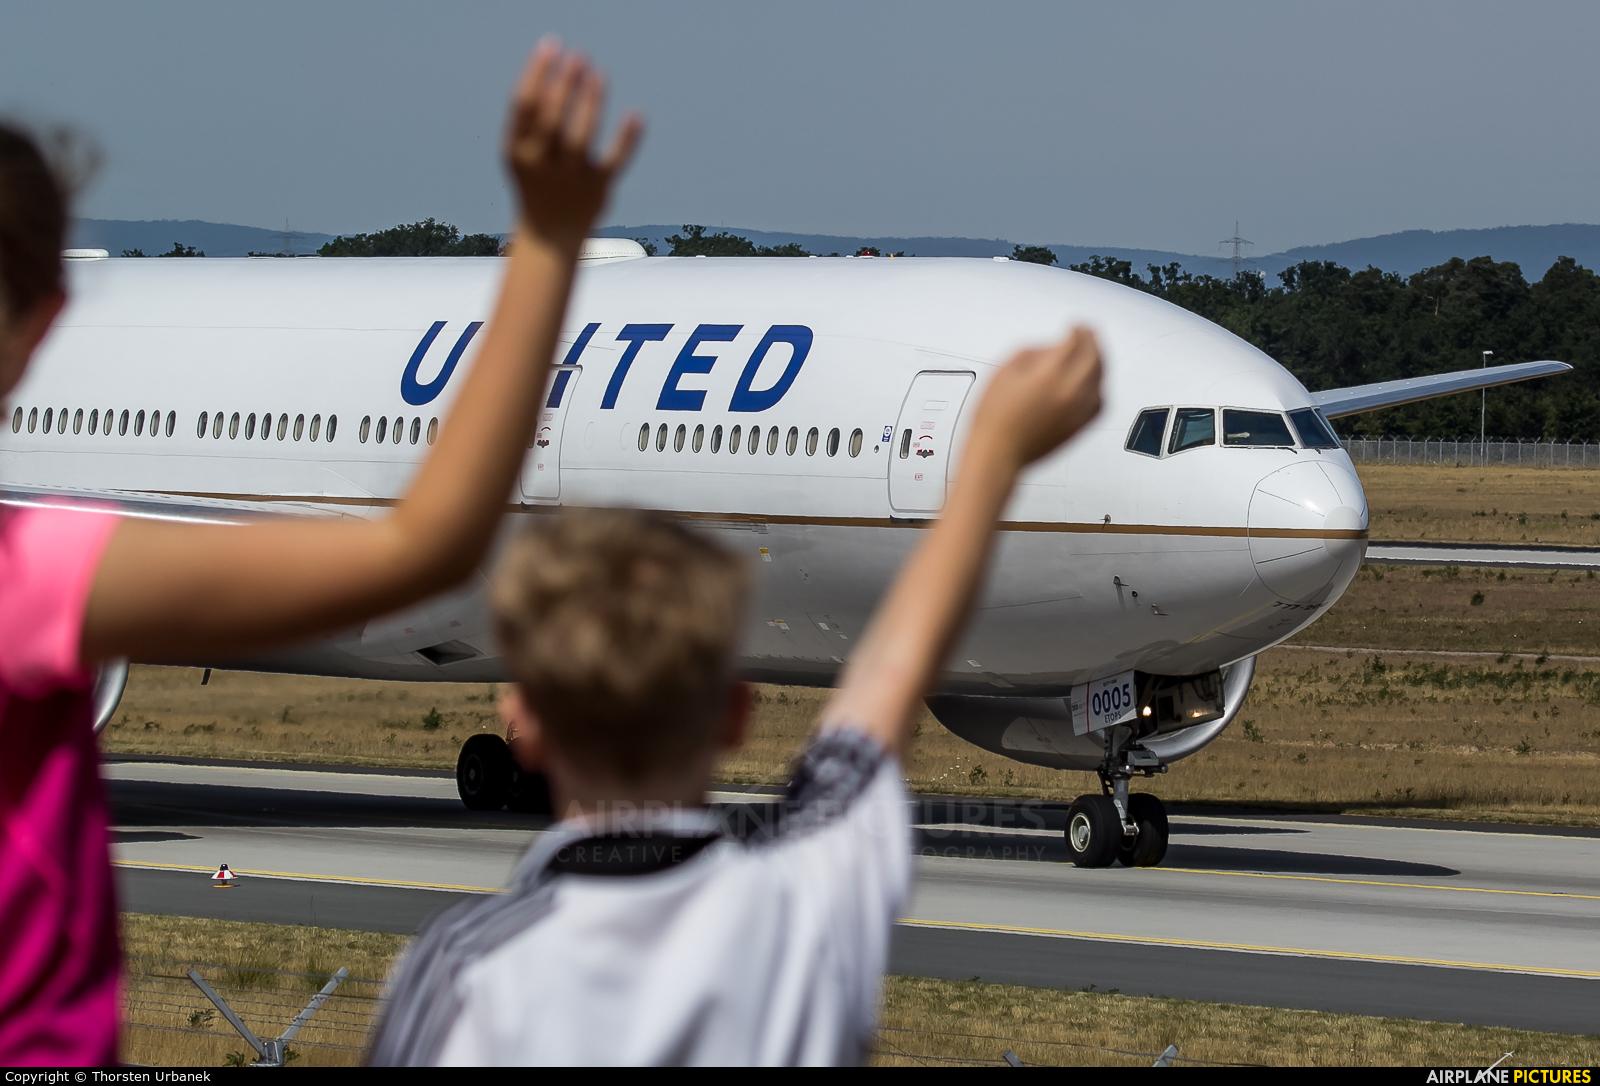 United Airlines N78005 aircraft at Frankfurt